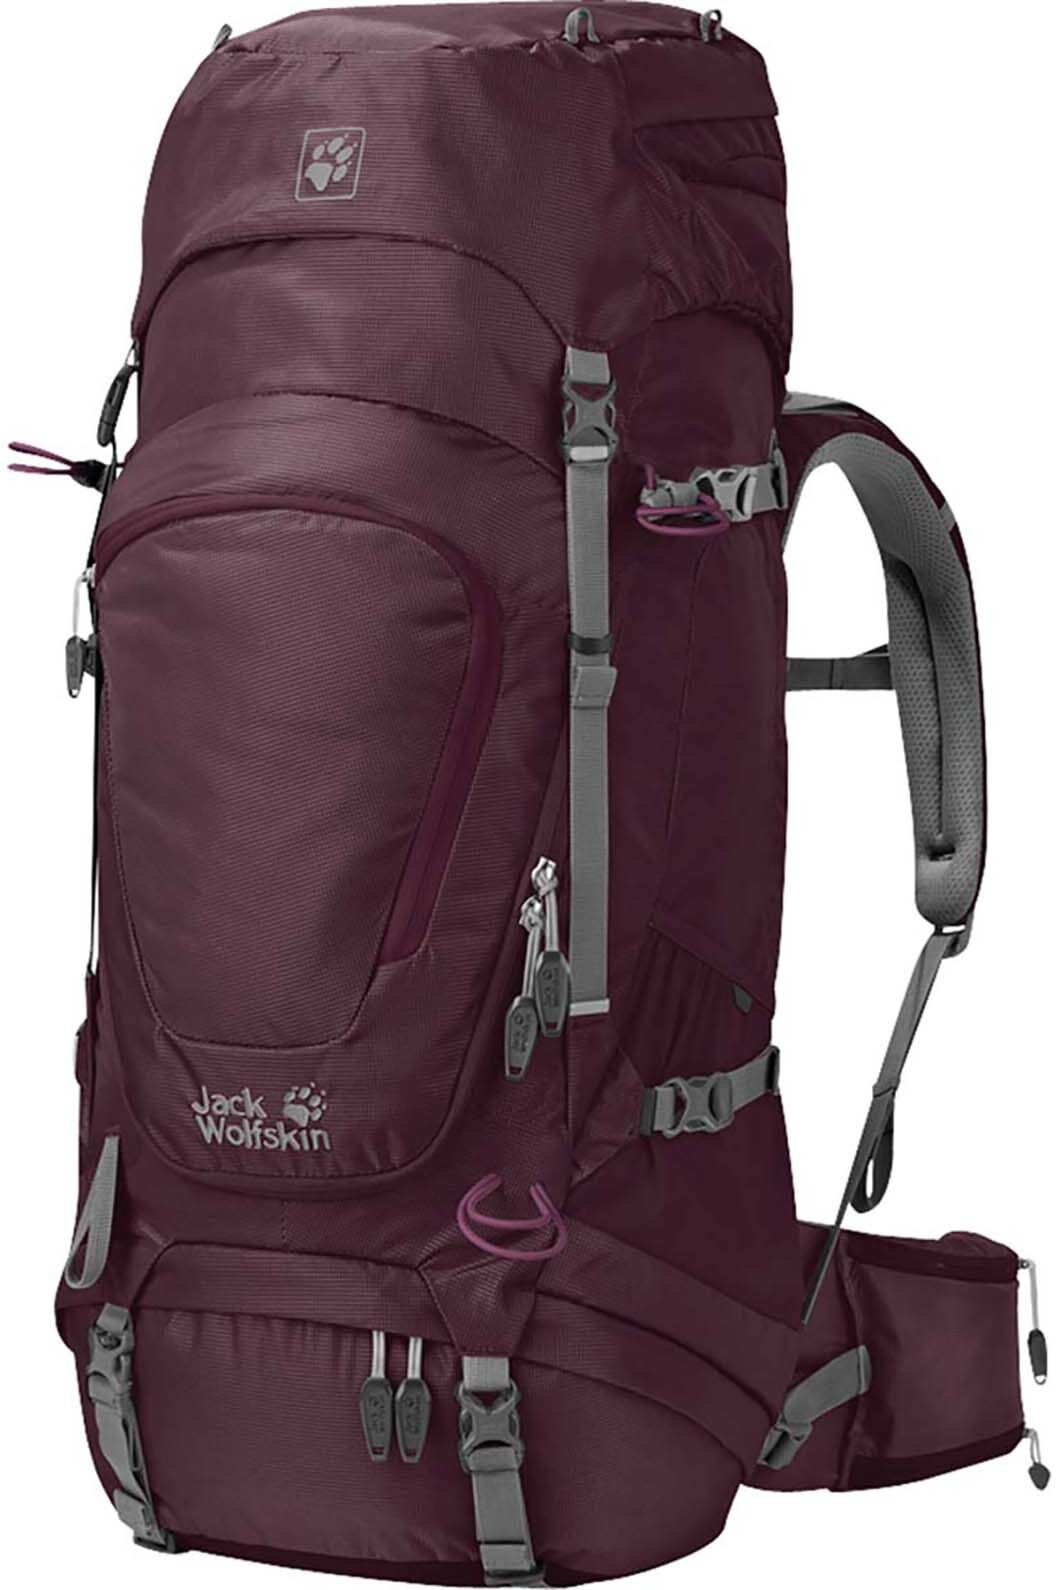 Jack Wolfskin Highland Trail XT Trekking Pack 45L, None, hi-res